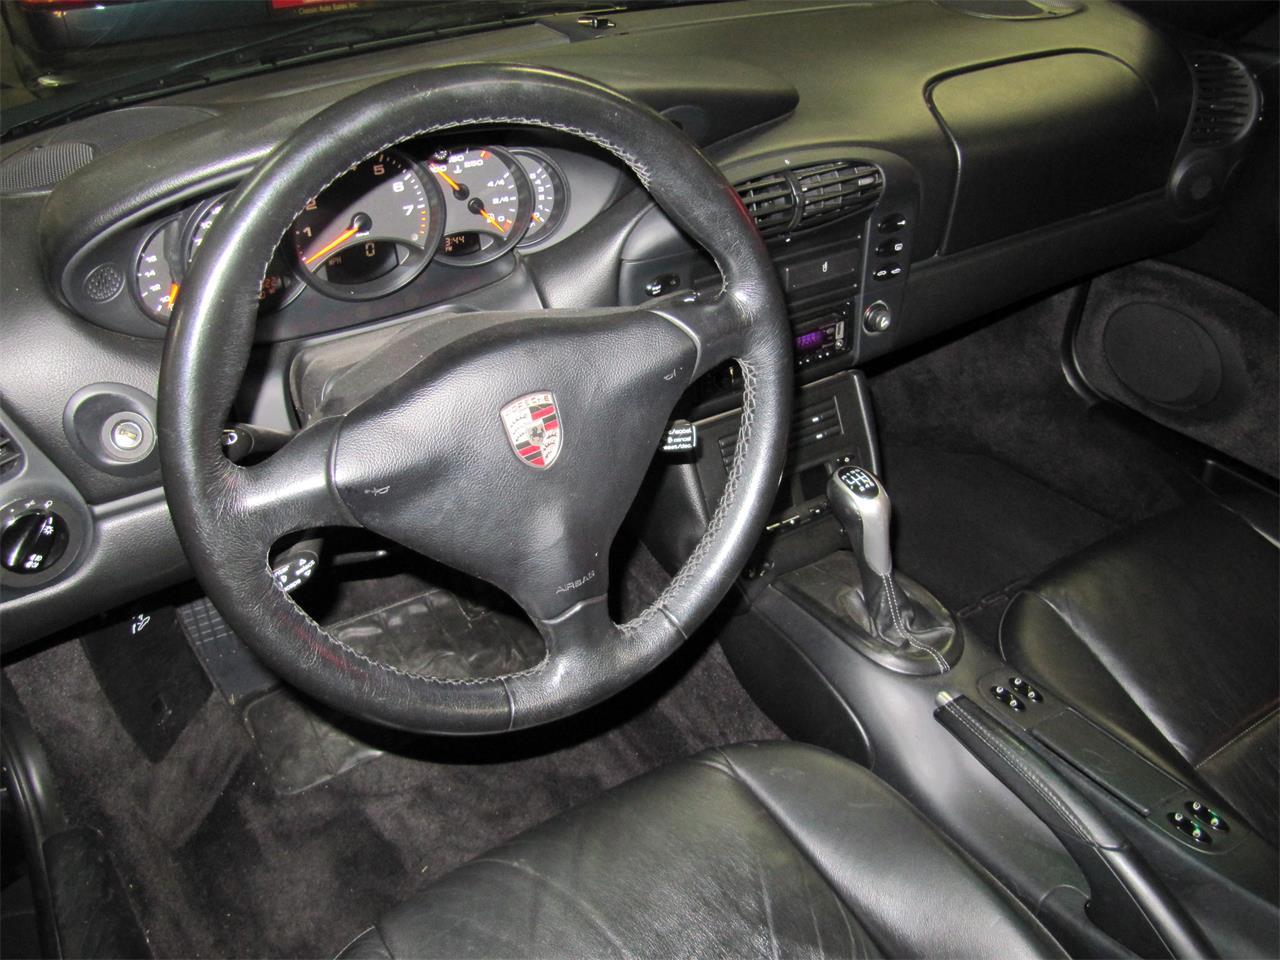 2001 Porsche 911 Carrera 4 Cabriolet (CC-1393047) for sale in Omaha, Nebraska